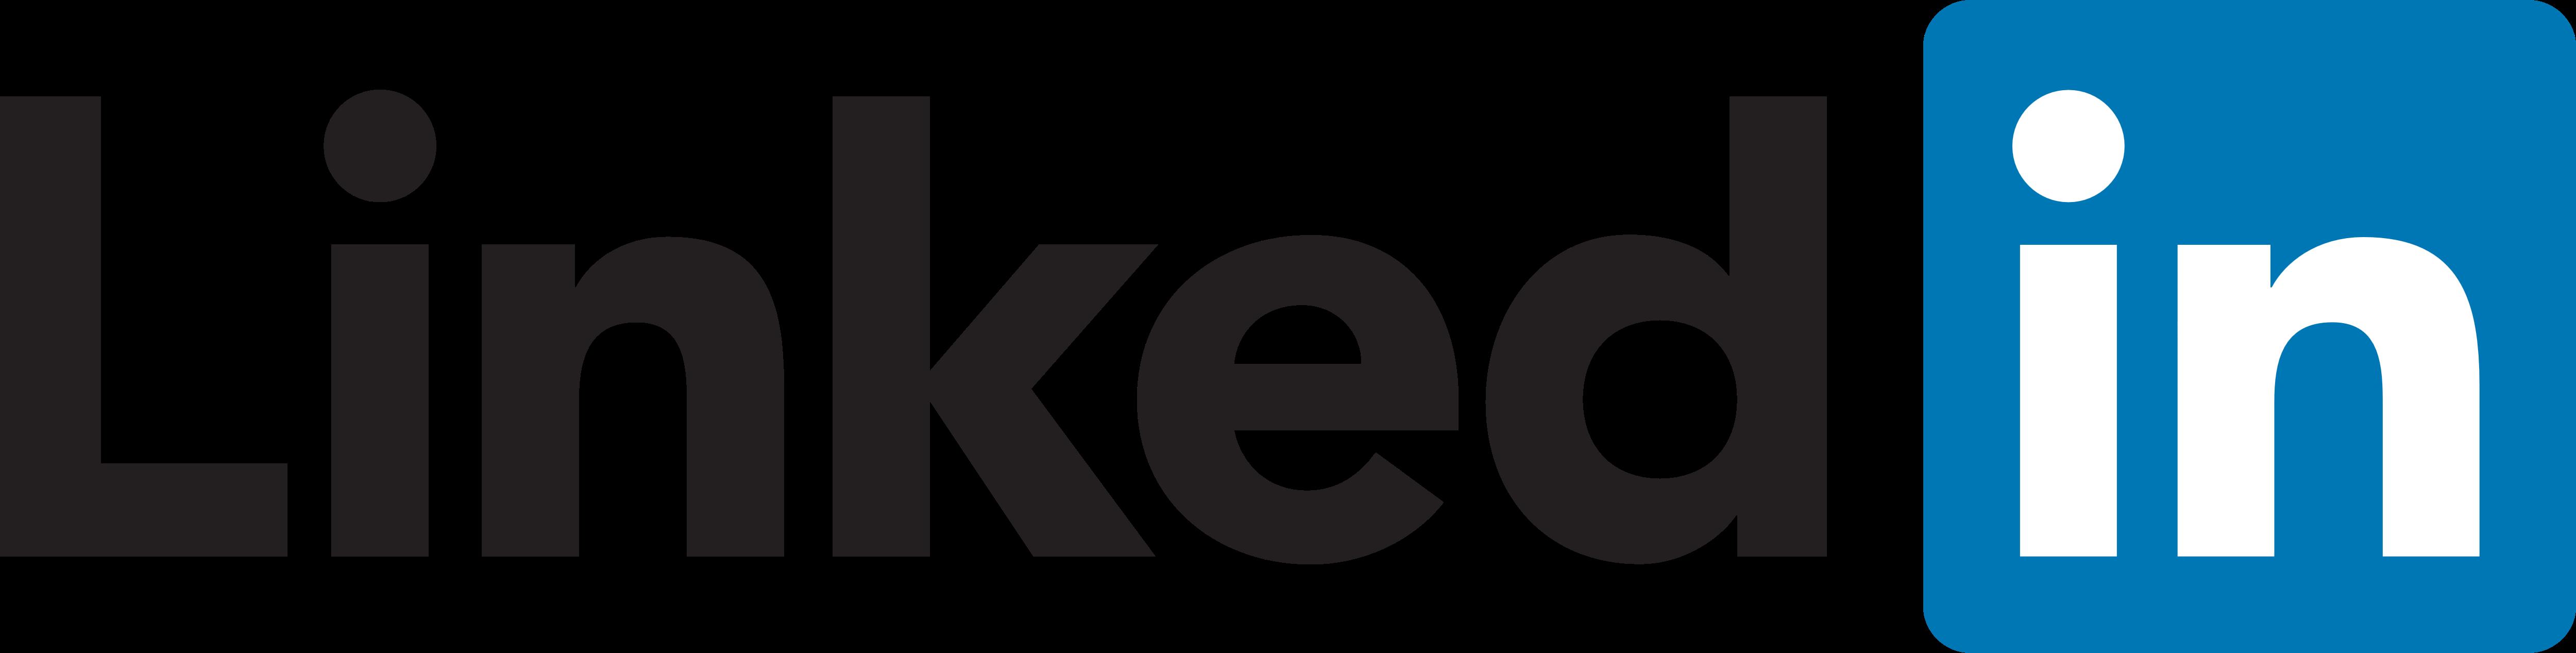 LinkedIn logo and link to Jackie Collis - RICS. LinkedIn page